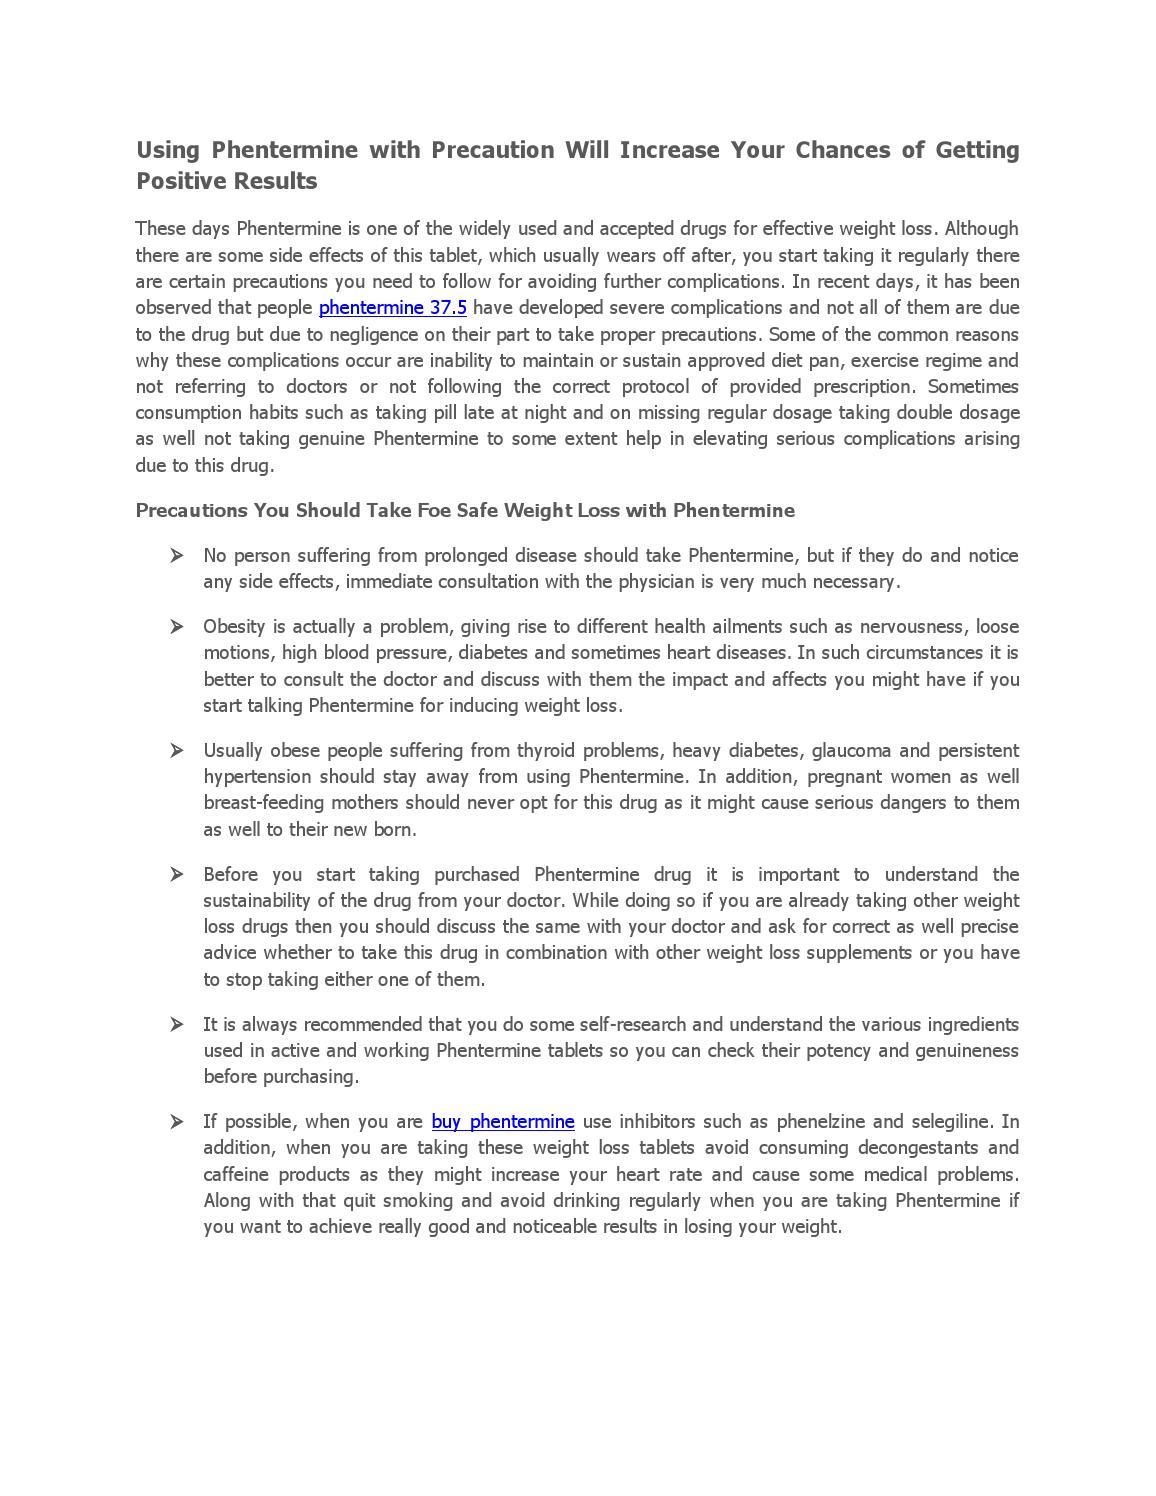 crna school application essay